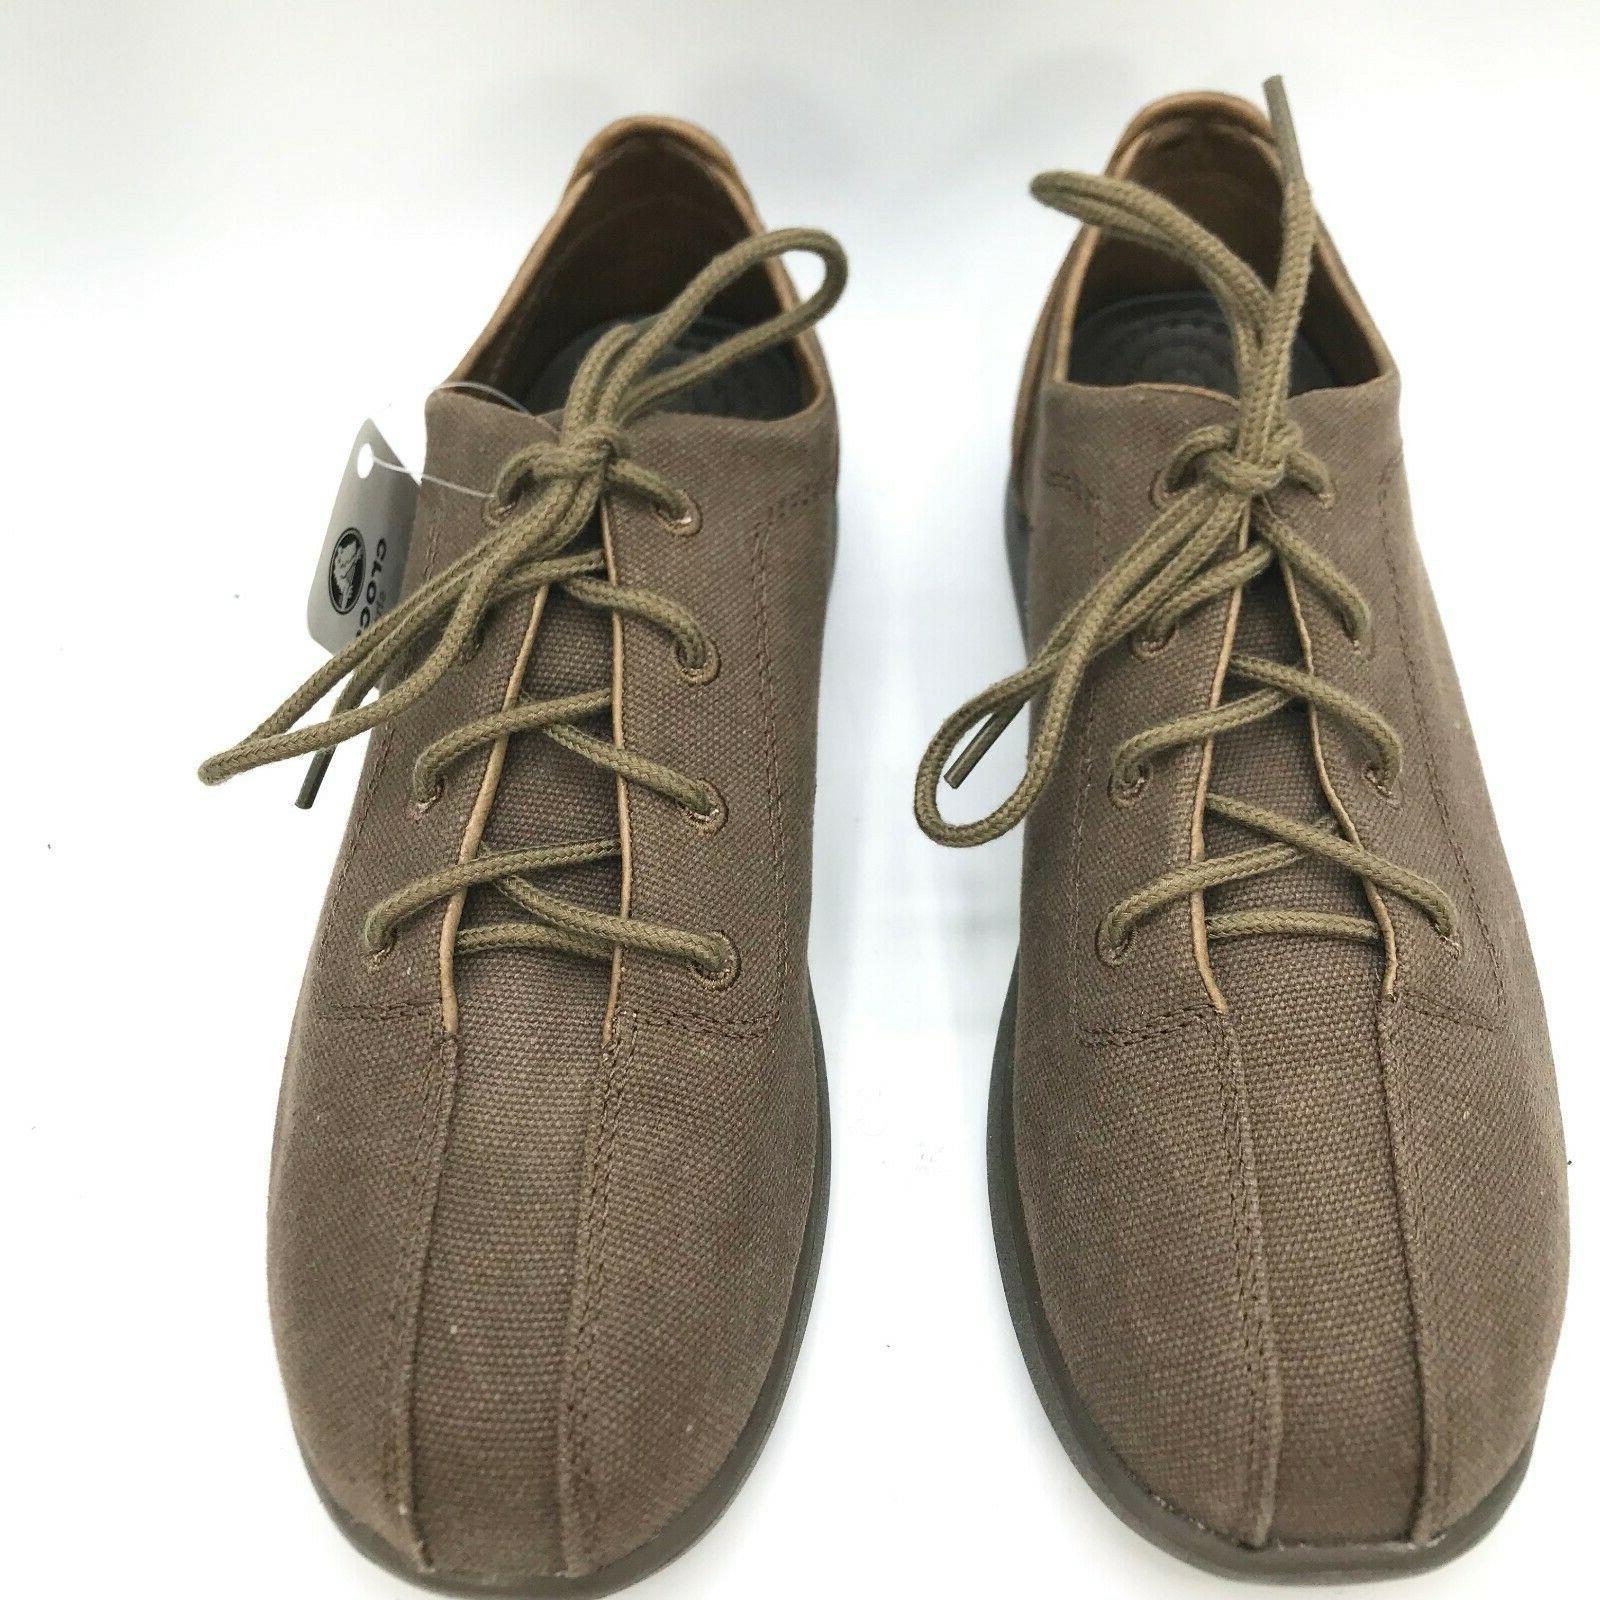 CROCS Casual Canvas Up Shoe